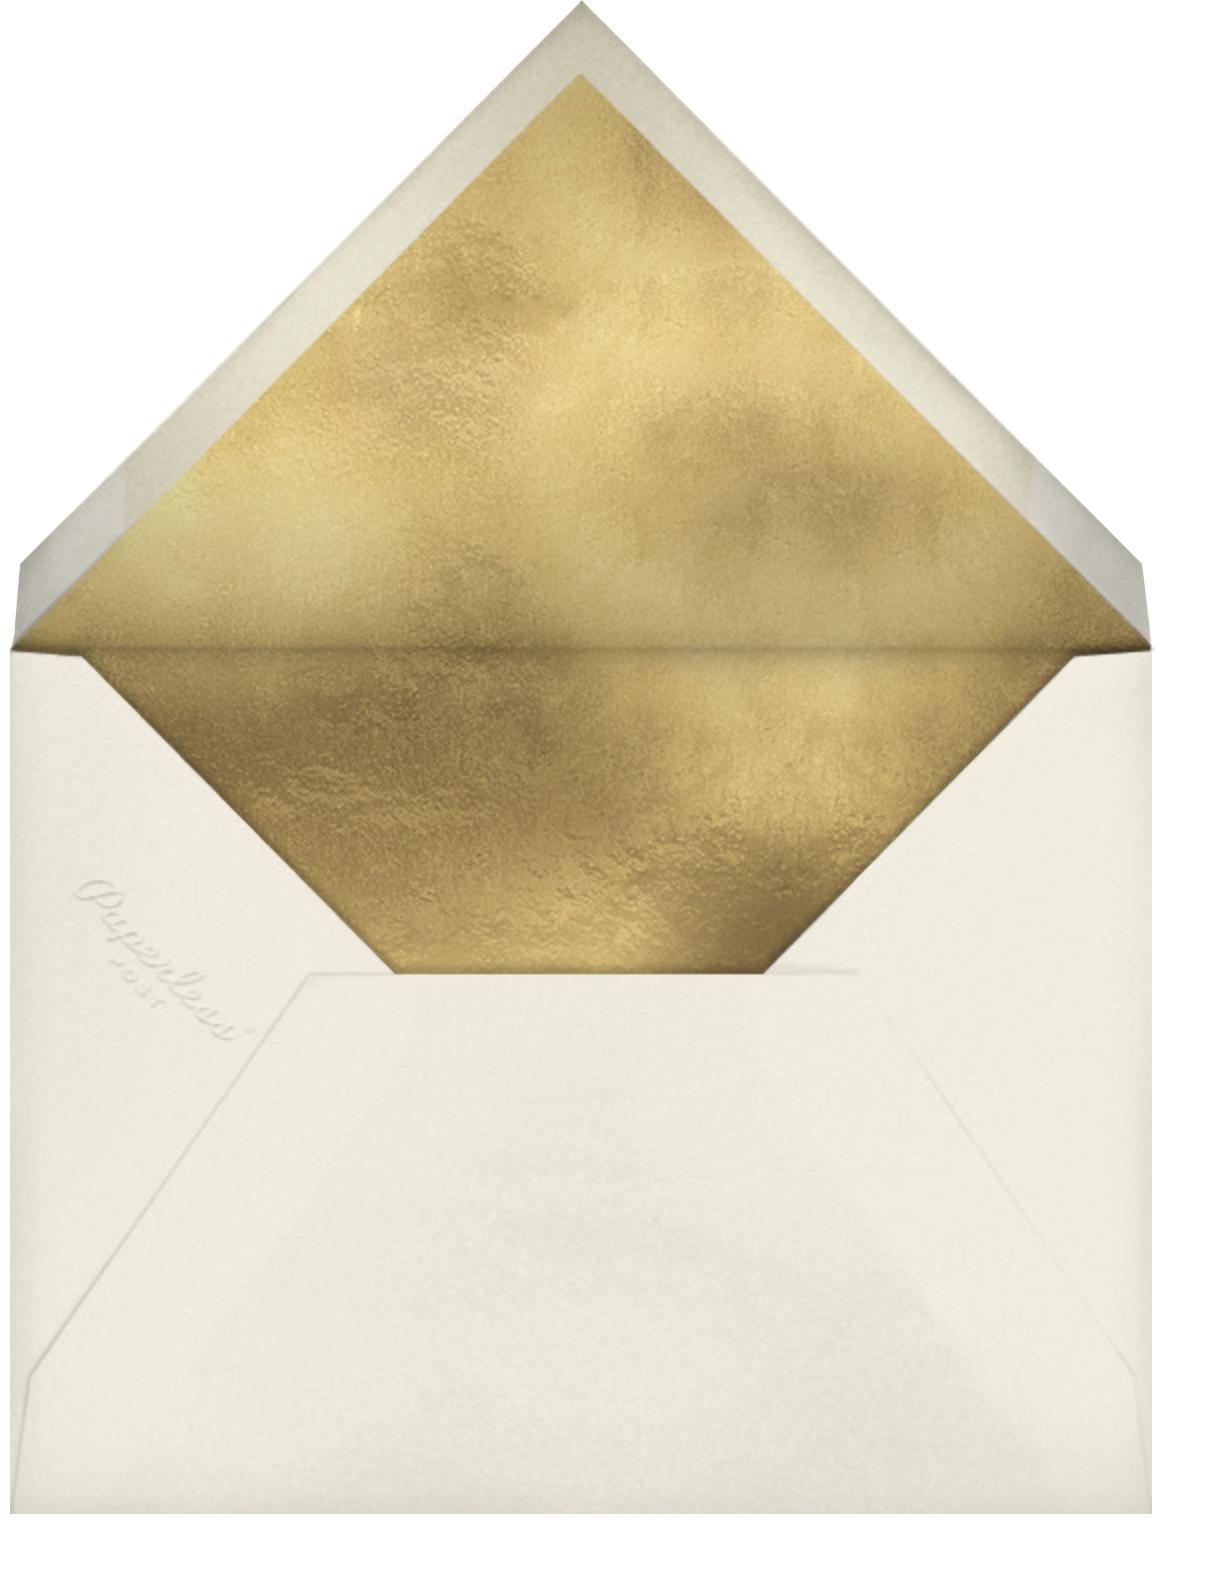 Royal Botanical - Cream - Oscar de la Renta - Envelope